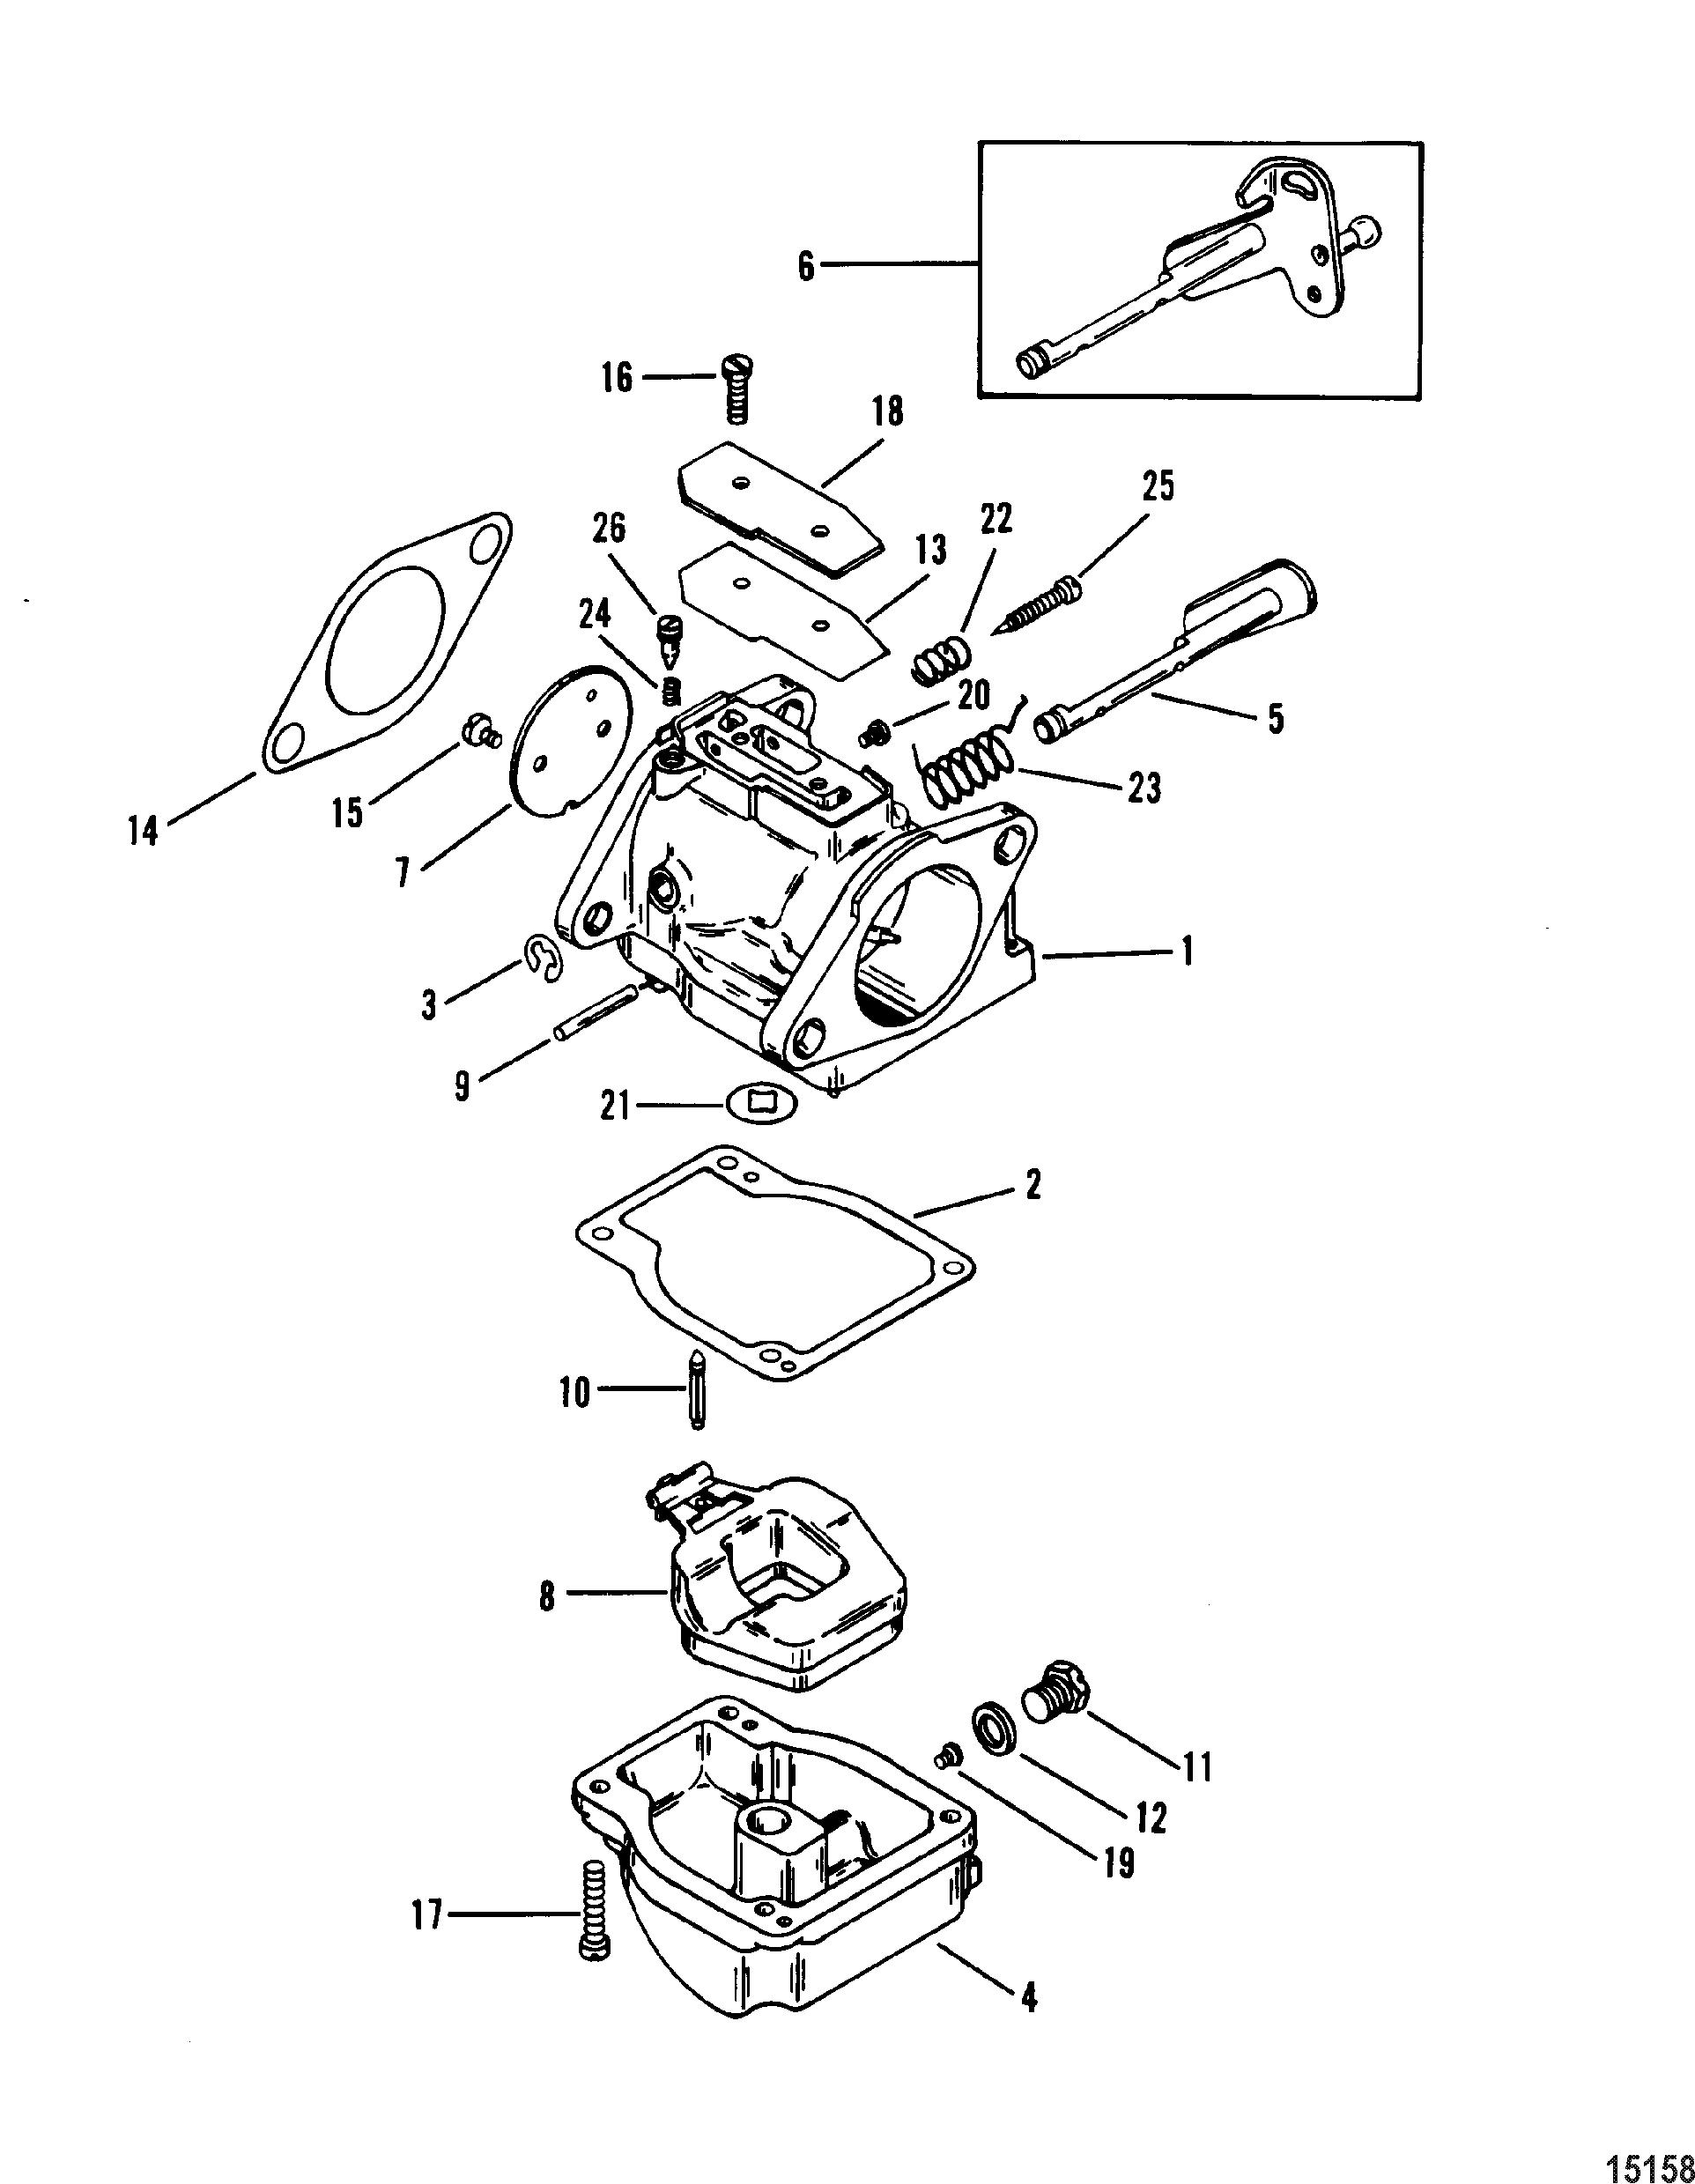 Carburetor FOR MARINER / MERCURY 70/75/80/90 HP 3 CYLINDER